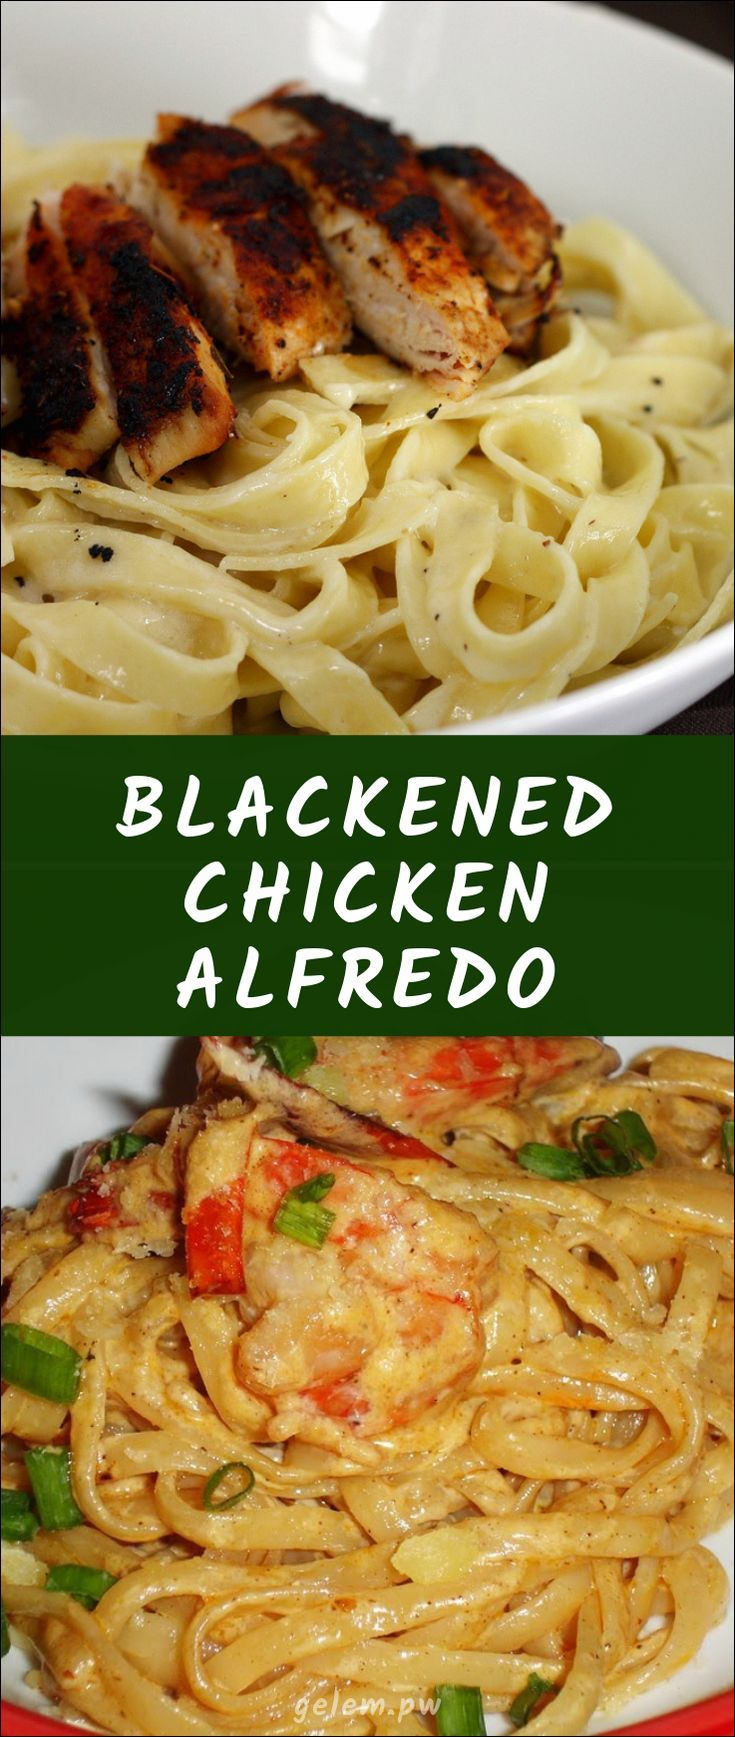 Blackened chicken alfredo blackened chicken alfredo